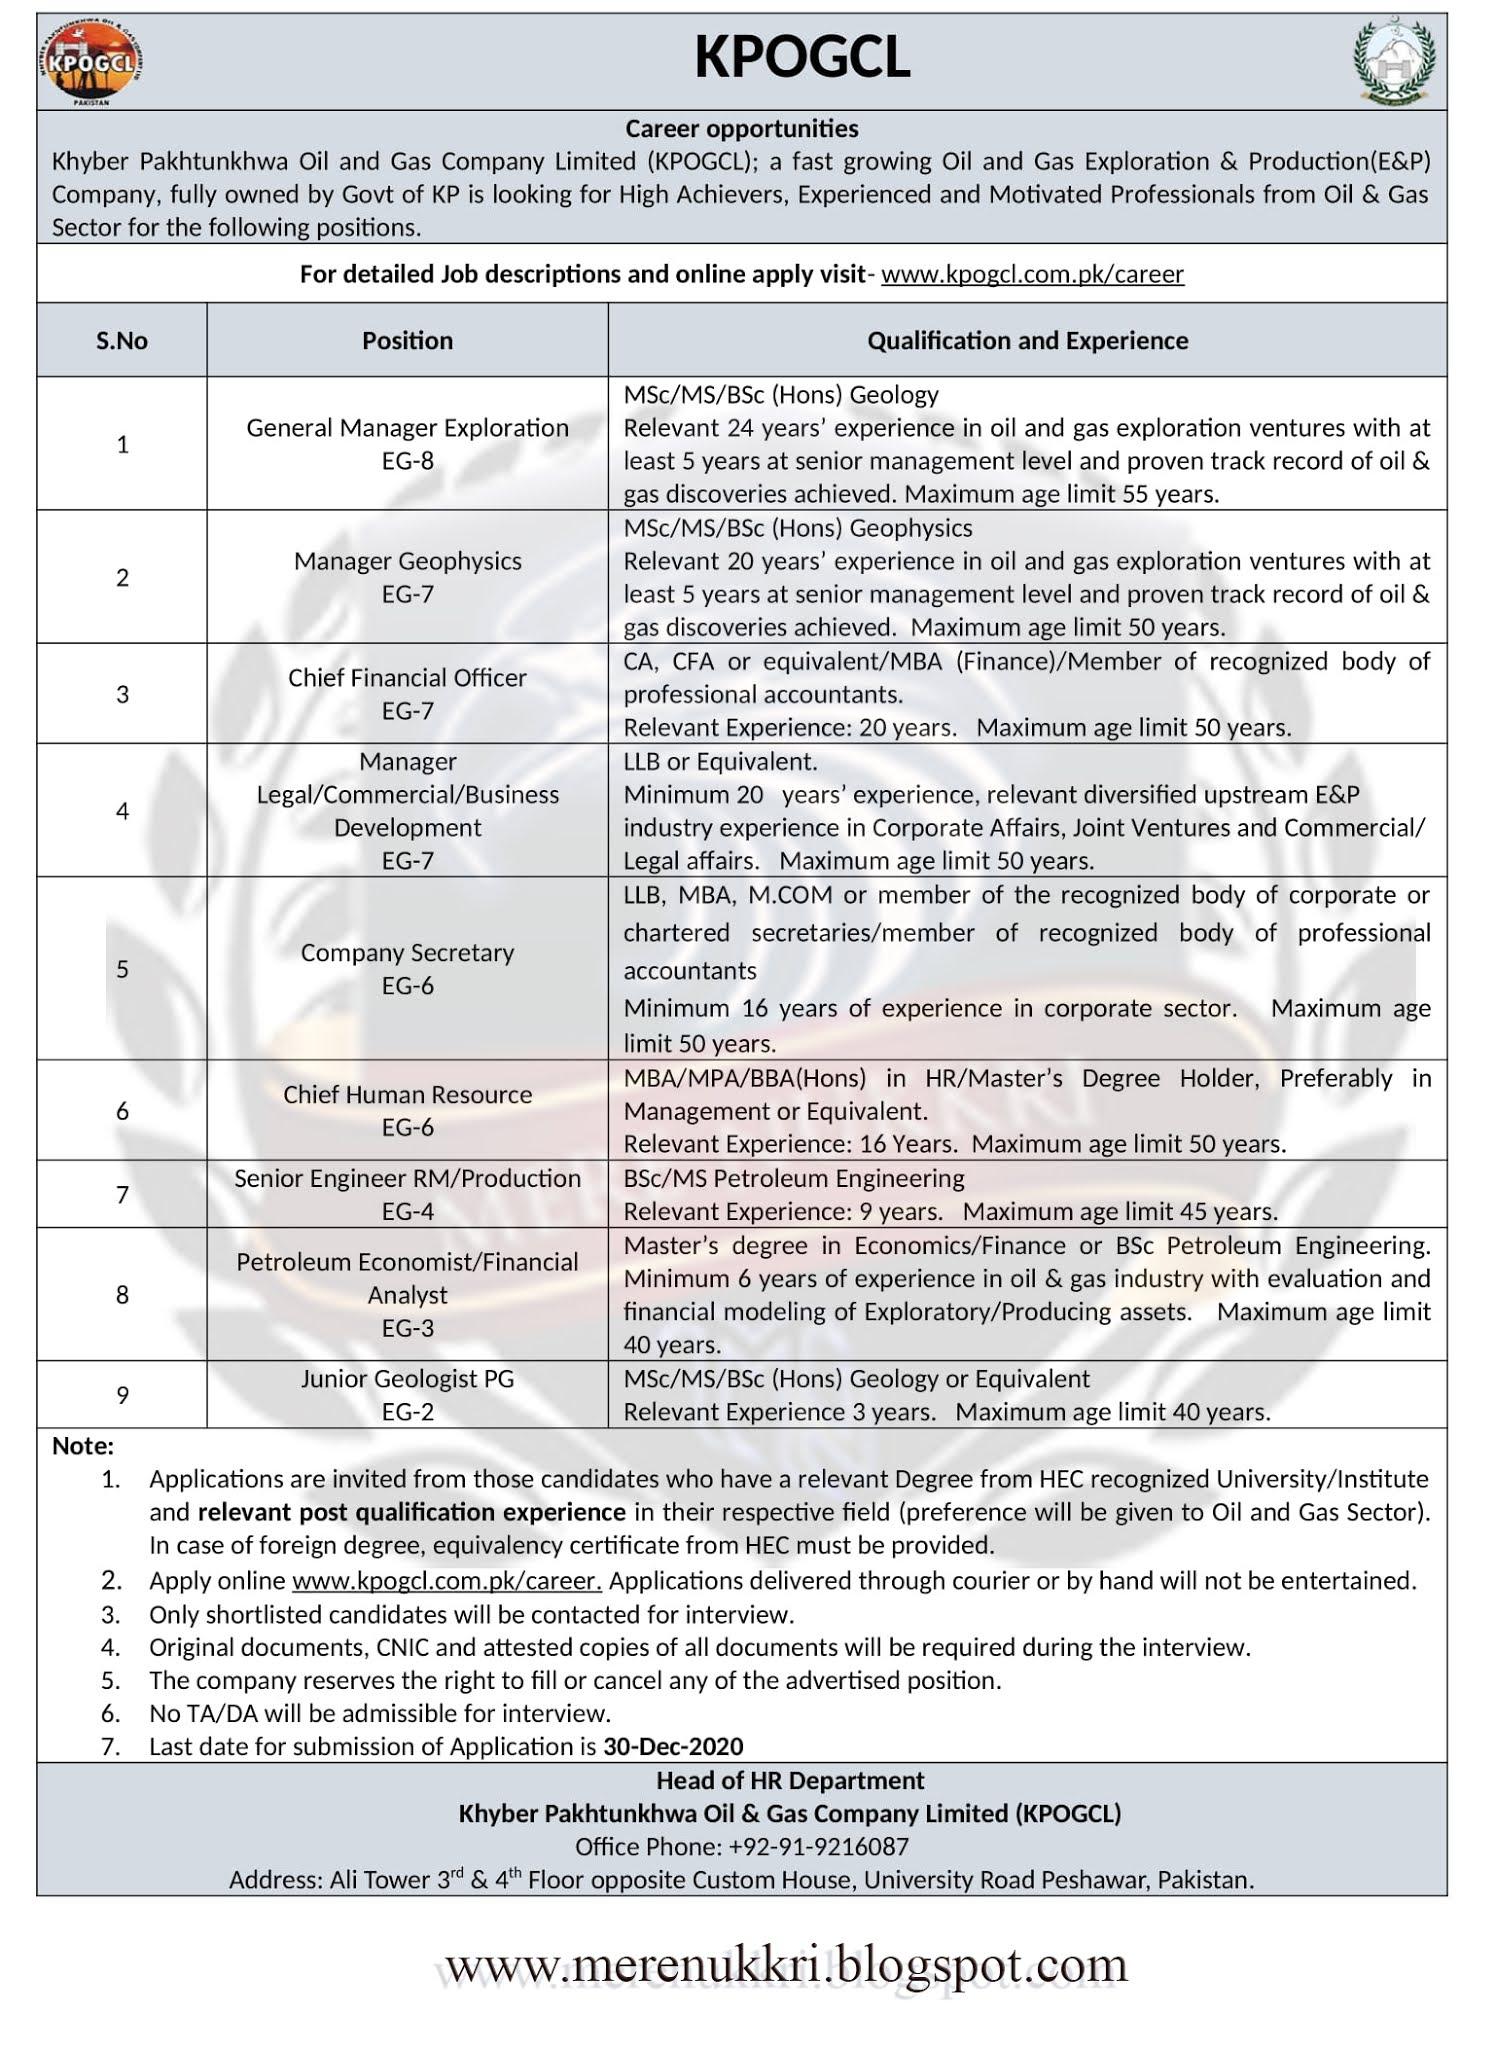 KPOGCL Jobs 2020   KPK Oil and Gas Company Ltd – Apply Now merenukkri24.gq